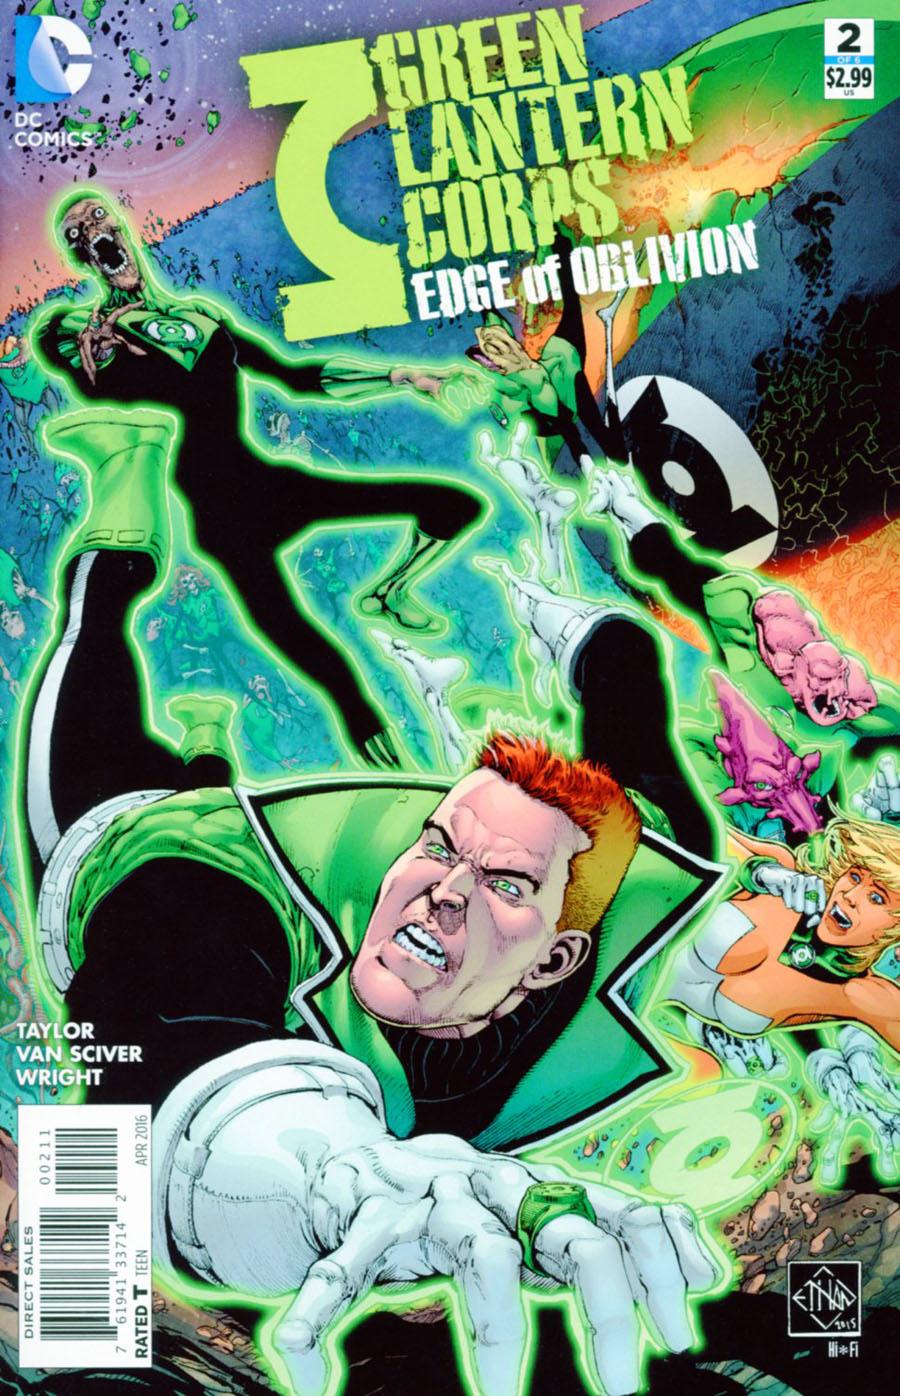 Green Lantern Corps Edge Of Oblivion #2